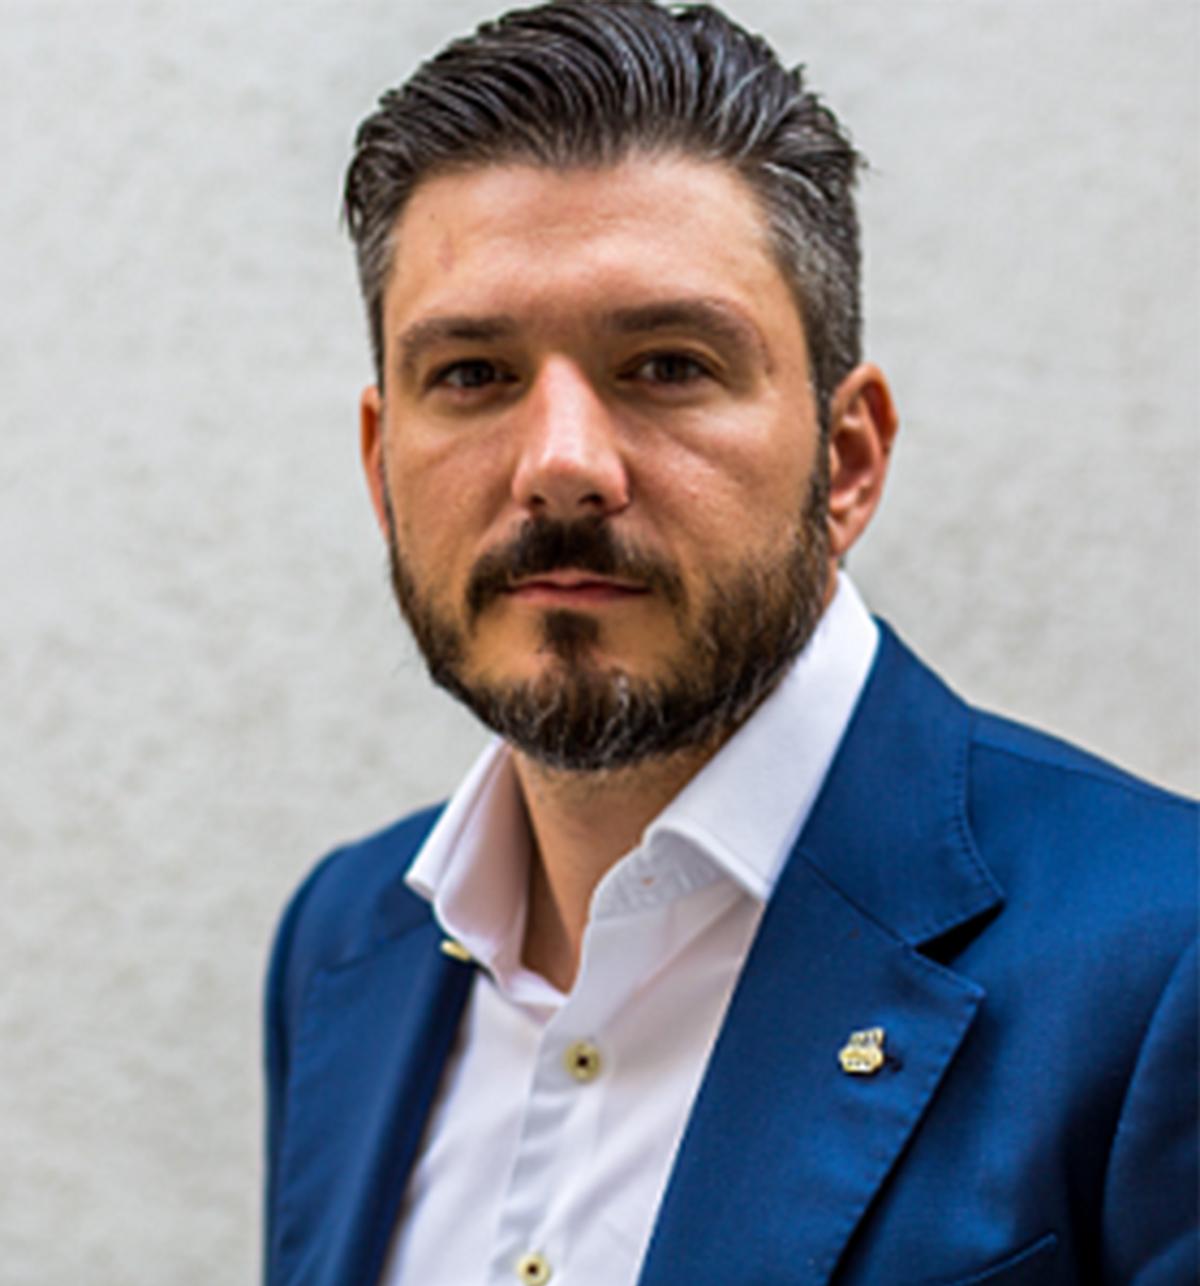 Erick Pomin Selzelin